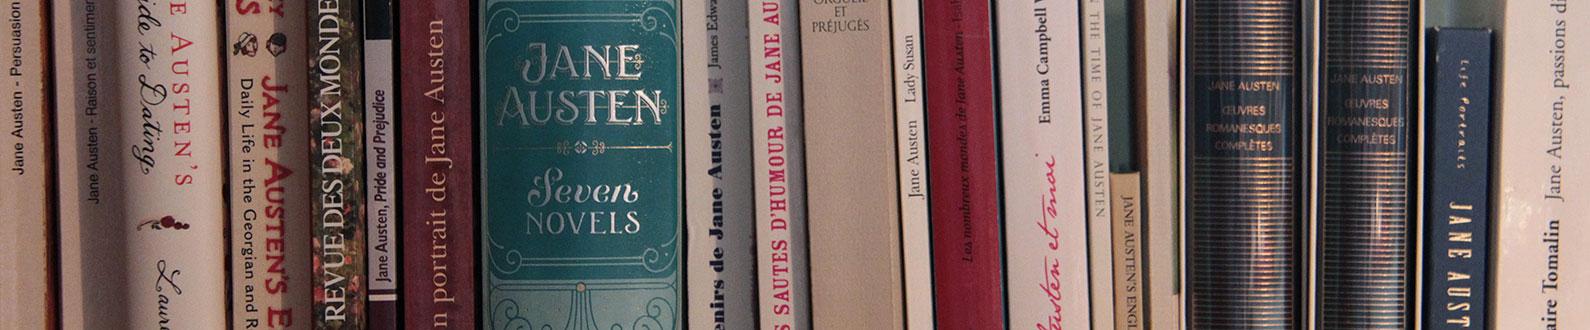 Jane Austen par Nathalie Novi